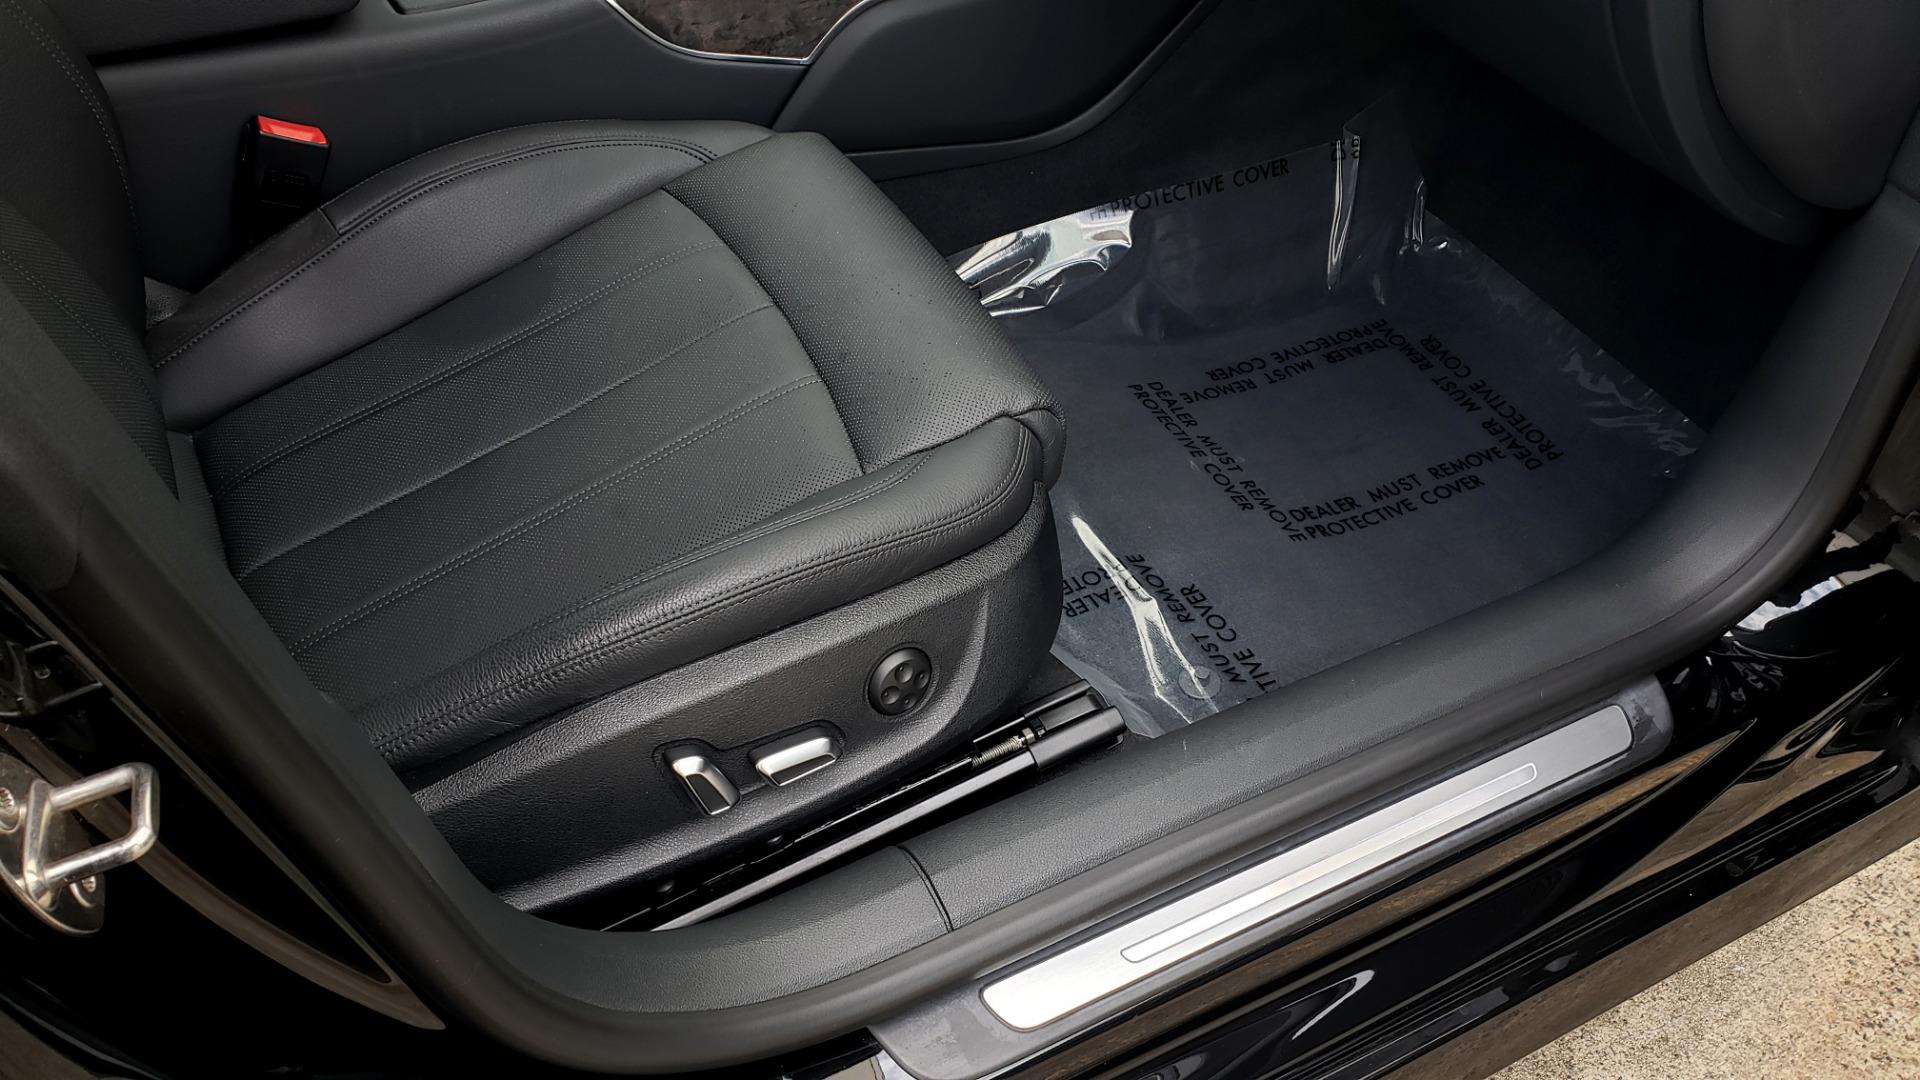 Used 2017 Audi A7 PRESTIGE / DRVR ASST / S-LINE SPORT / NAV / REARVIEW for sale Sold at Formula Imports in Charlotte NC 28227 66